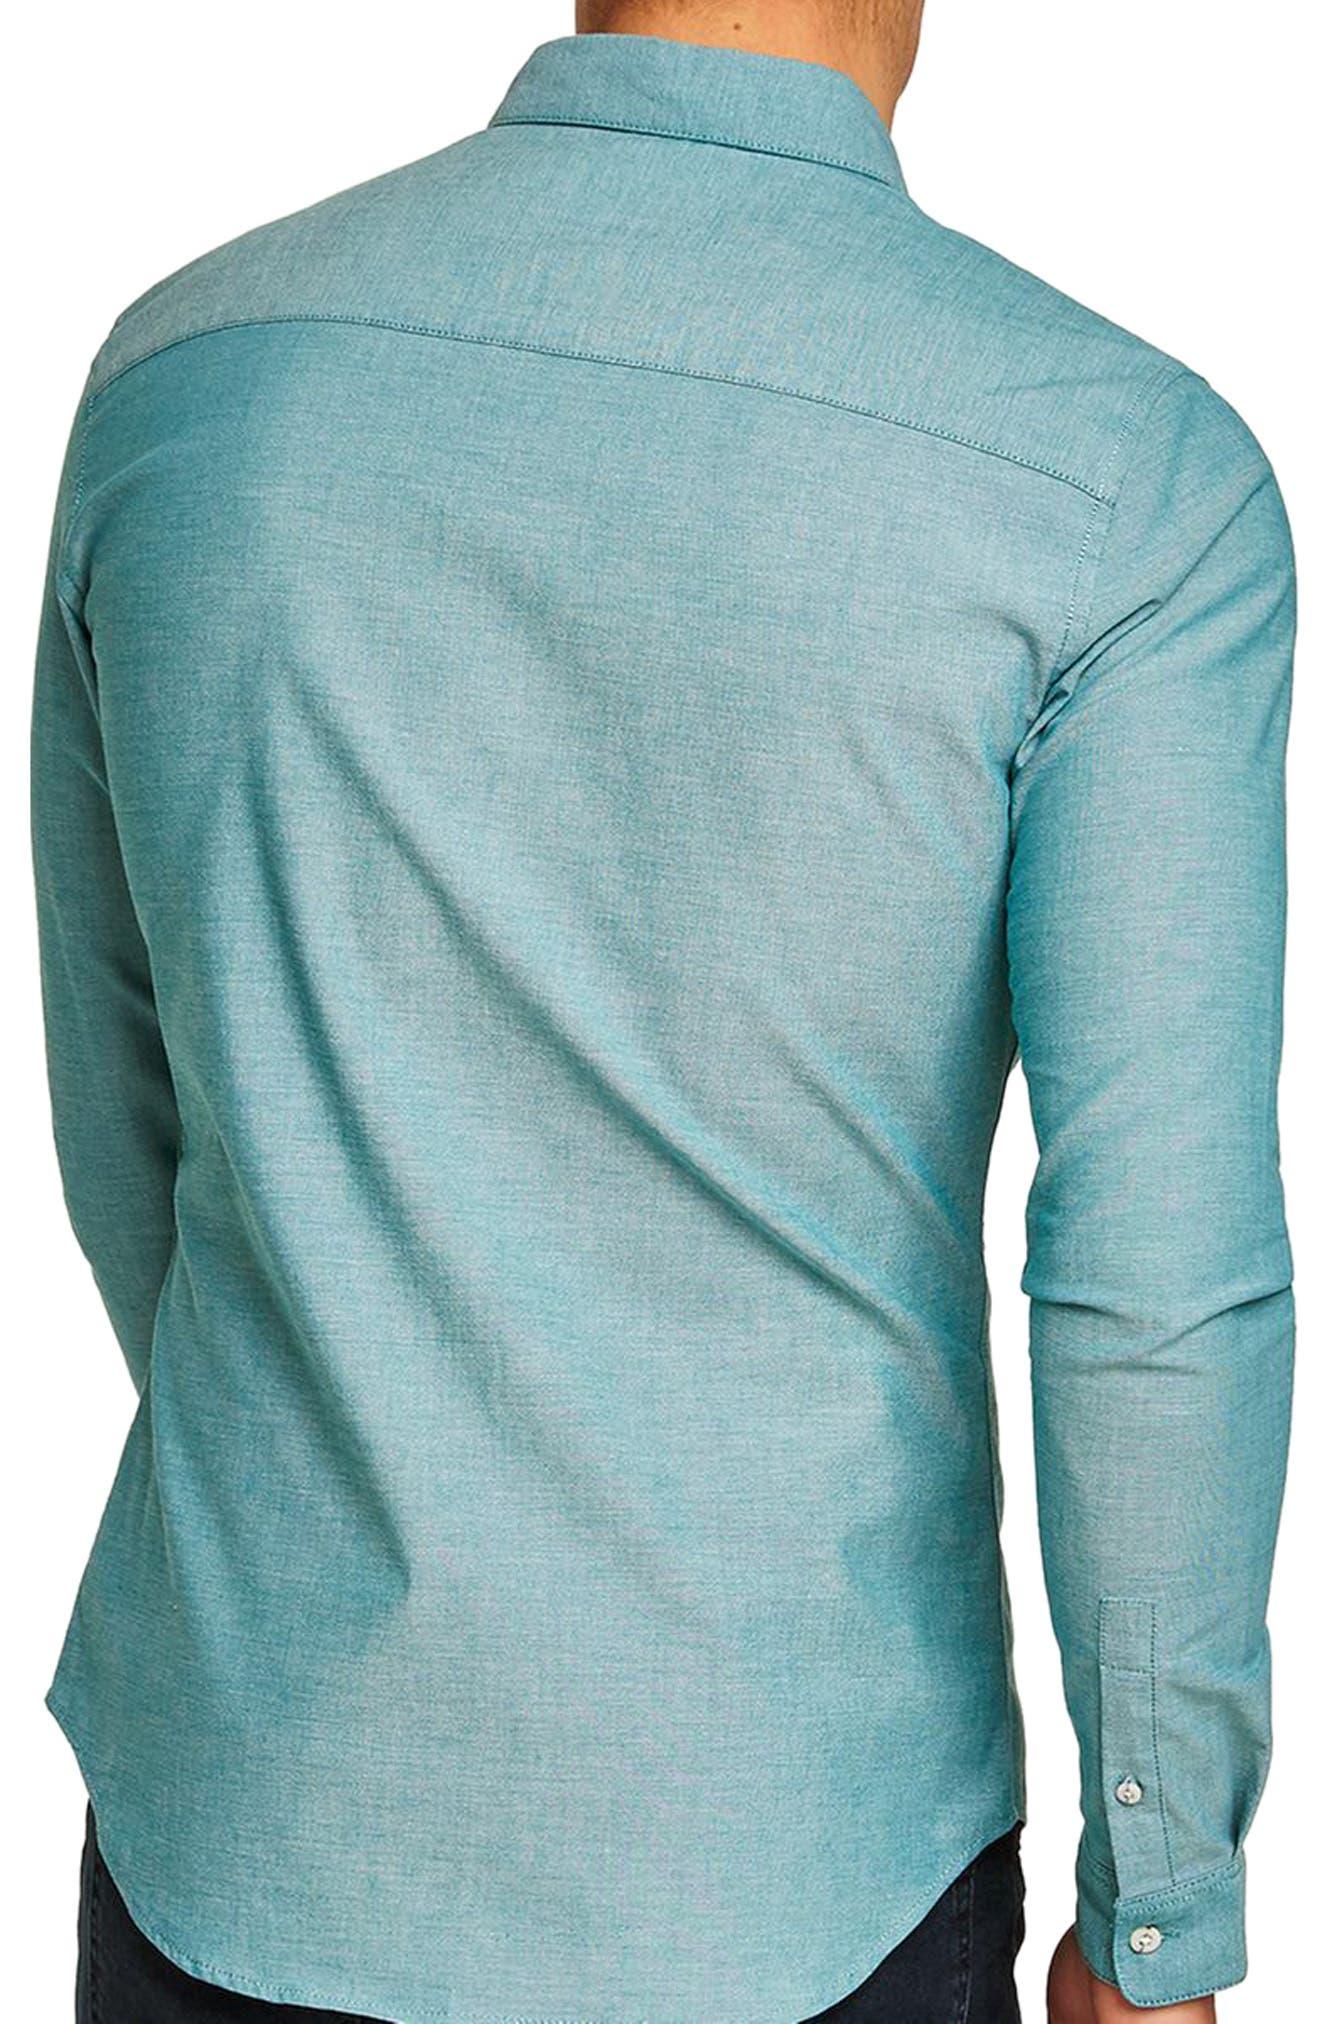 Muscle Fit Oxford Shirt,                             Alternate thumbnail 3, color,                             Blue